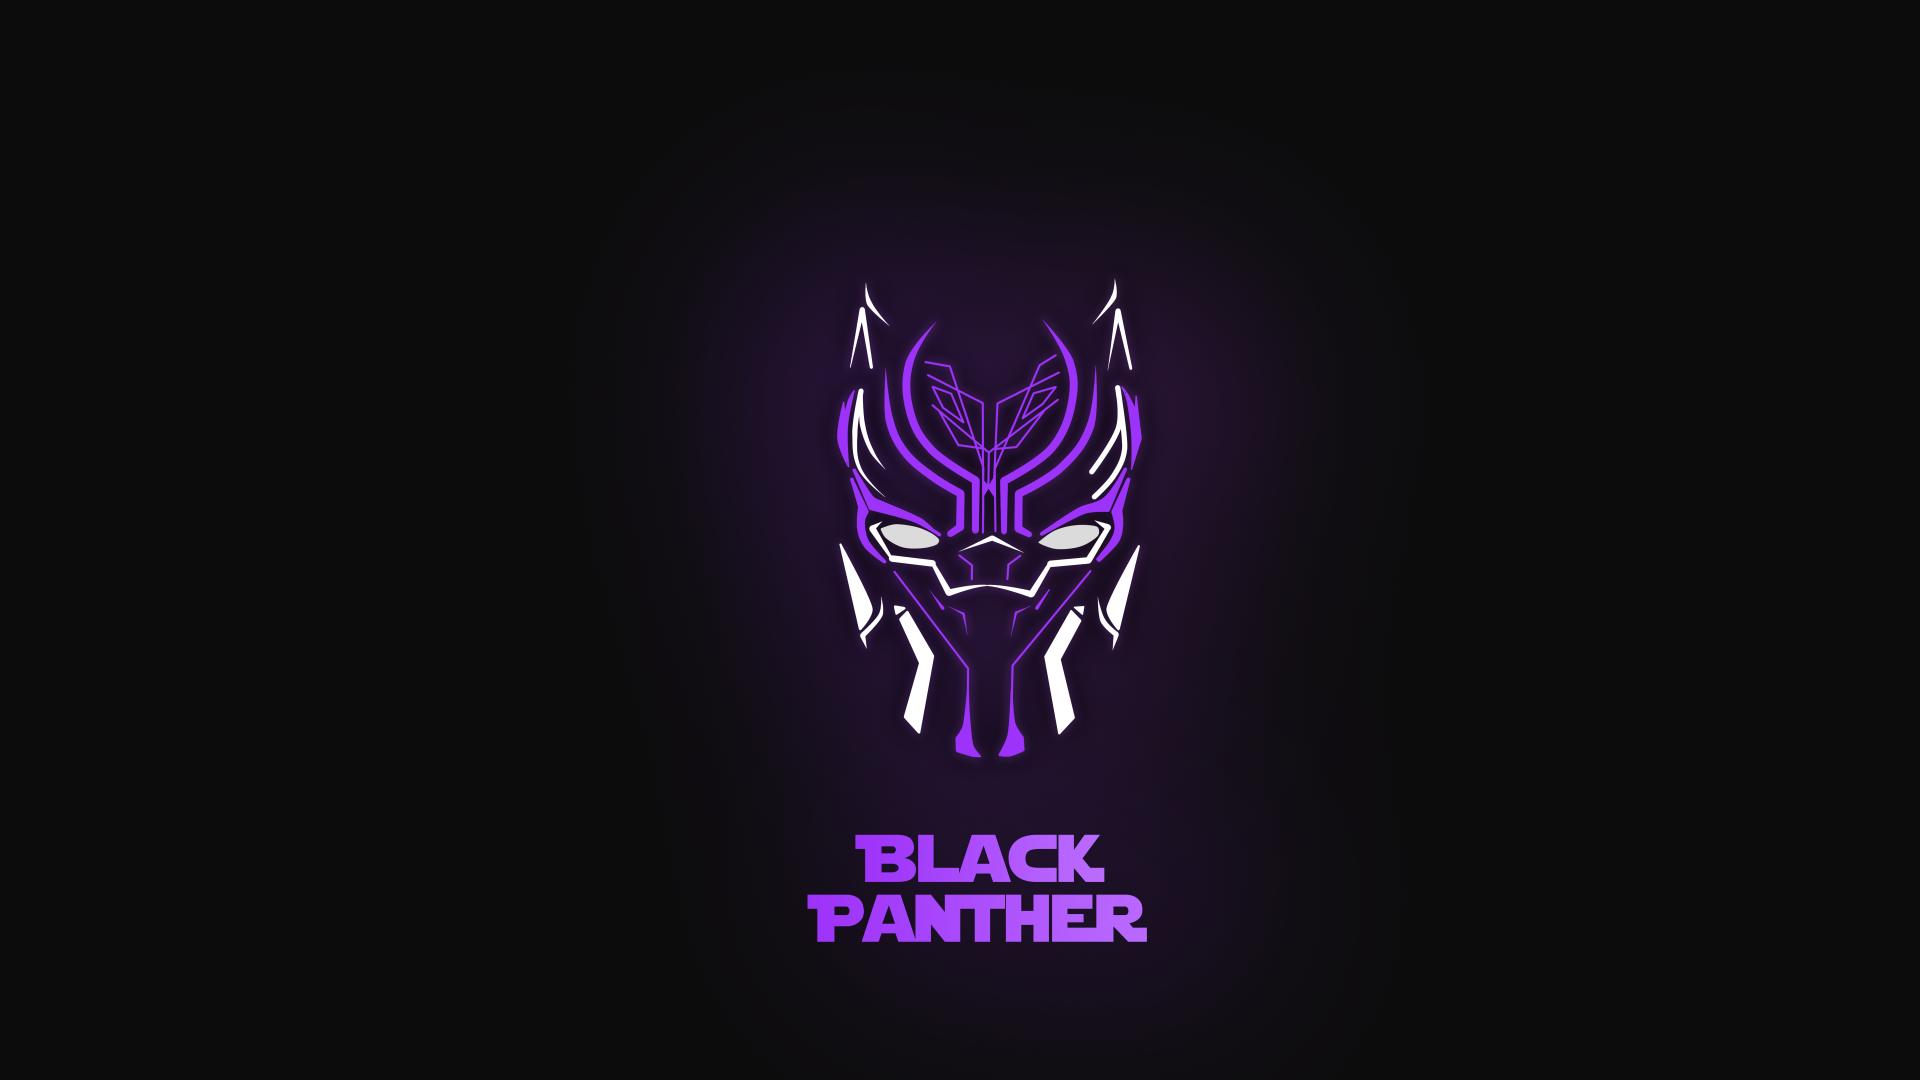 Download Wallpapers Of Black Panther Purple Dark Background Minimal Neon Hd 5k Creative Graphics Black Panther Hd Wallpaper Black Panther Neon Wallpaper